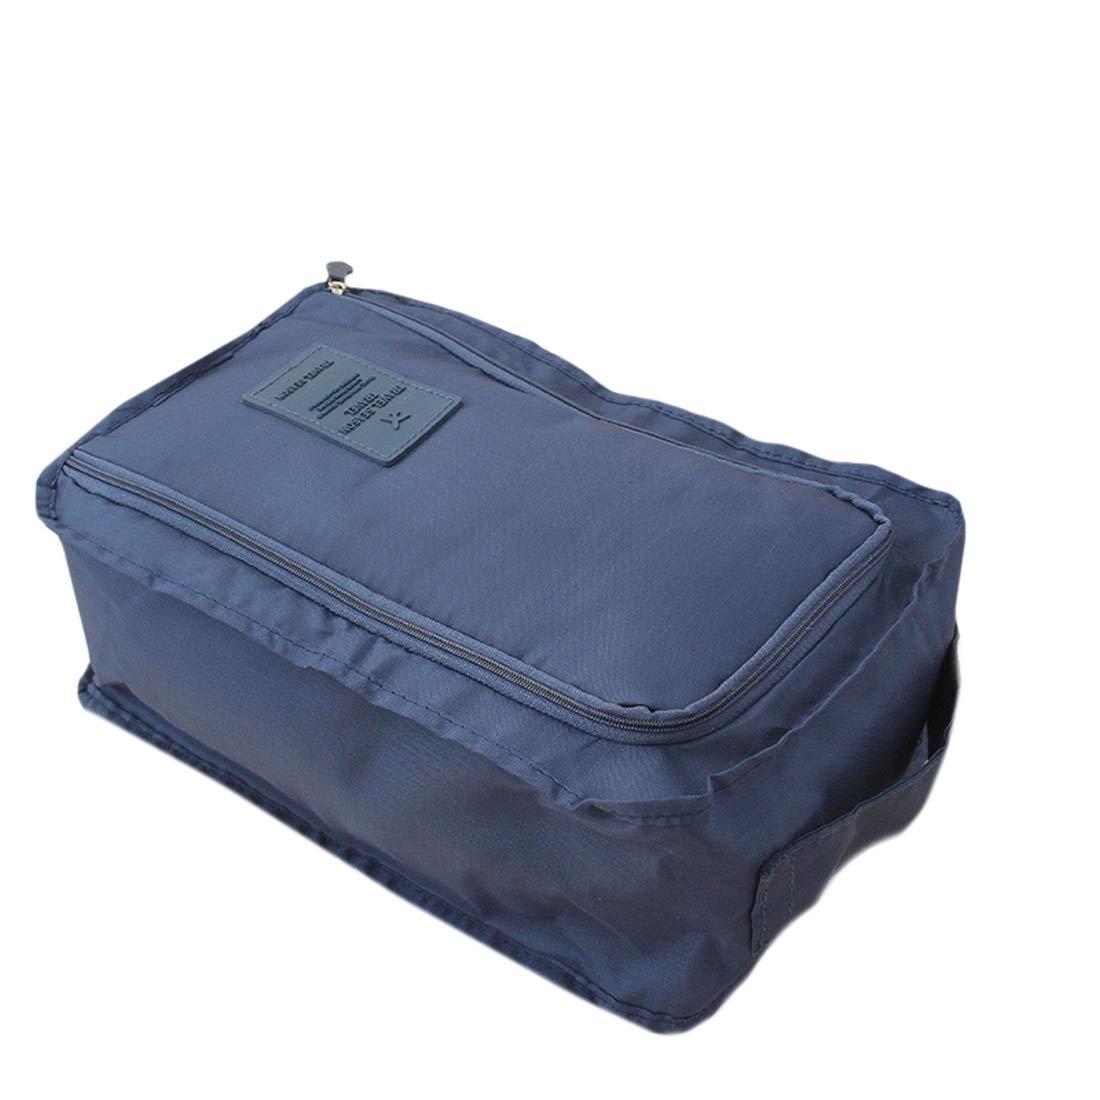 XIAMEND Portable Shoe Storage Bag New Outdoor Travel Portable Waterproof Nylon Shoe Bag Shoe Bag Color : Light blue